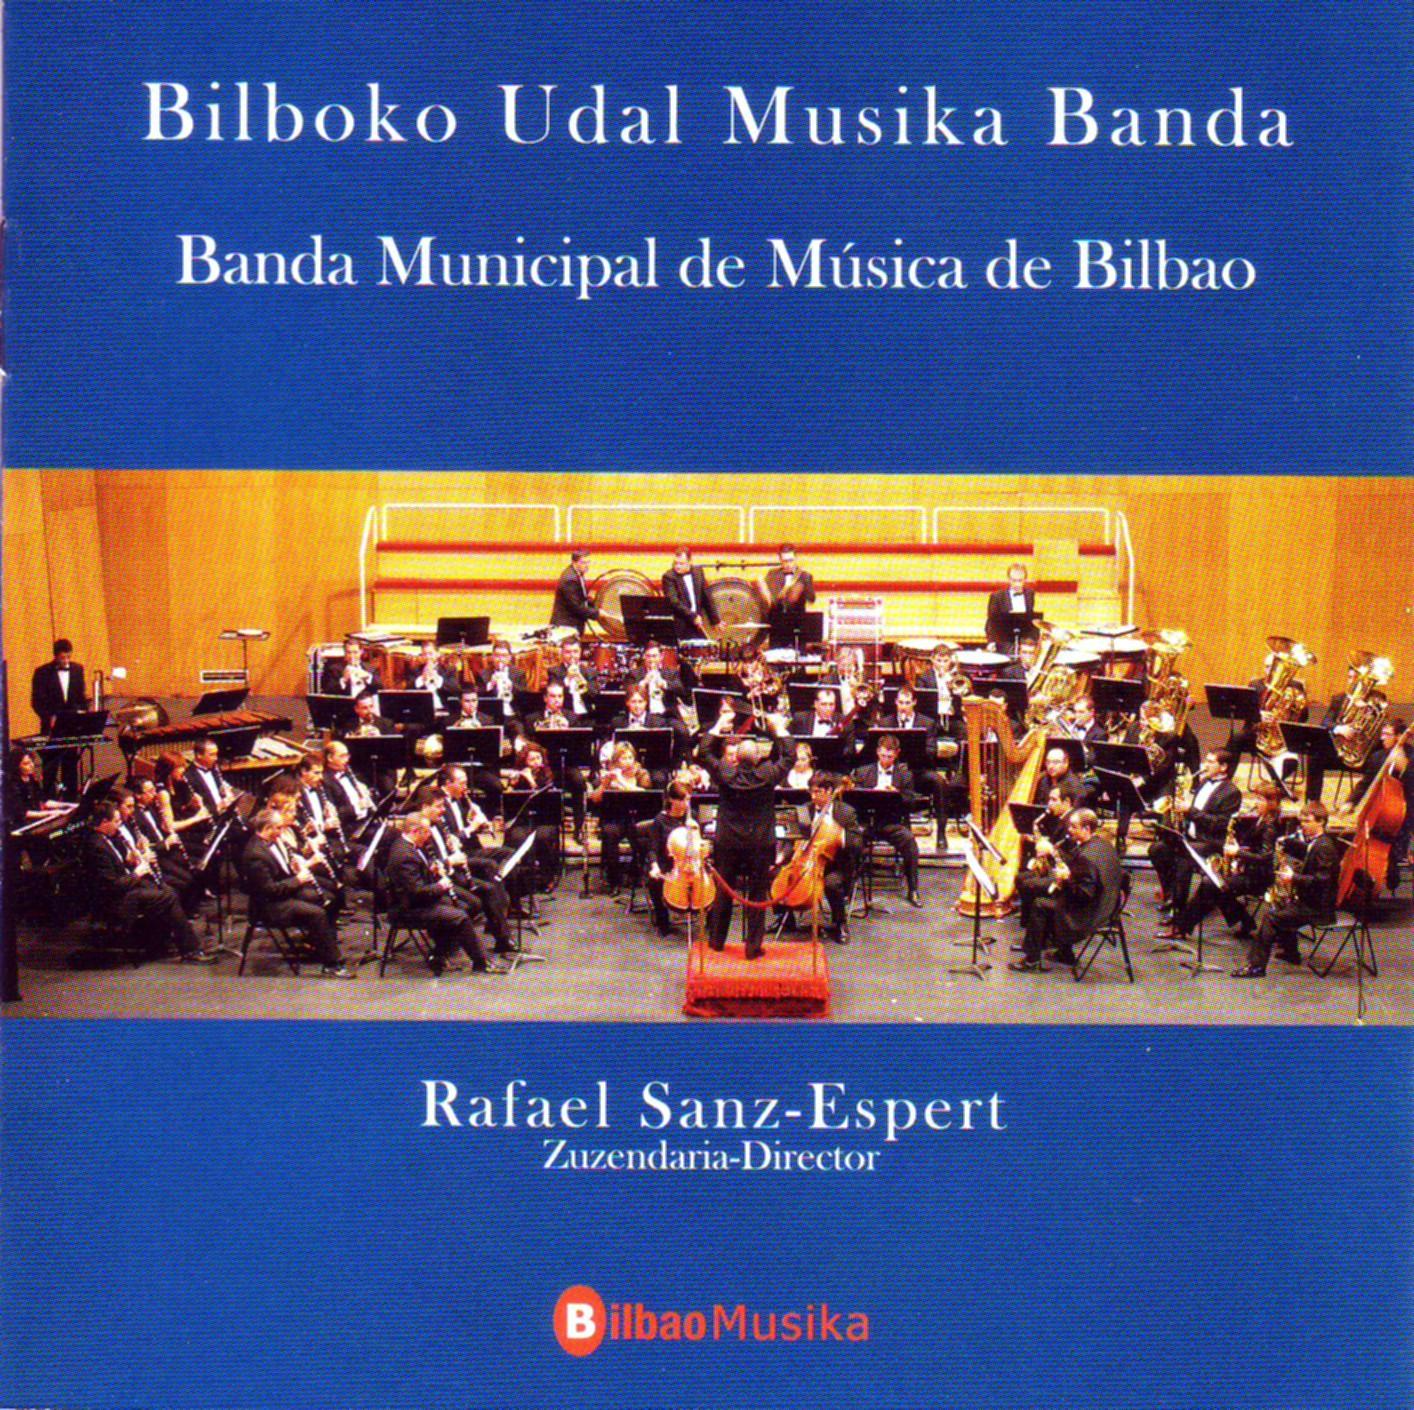 Bilboko Udal Musika Banda